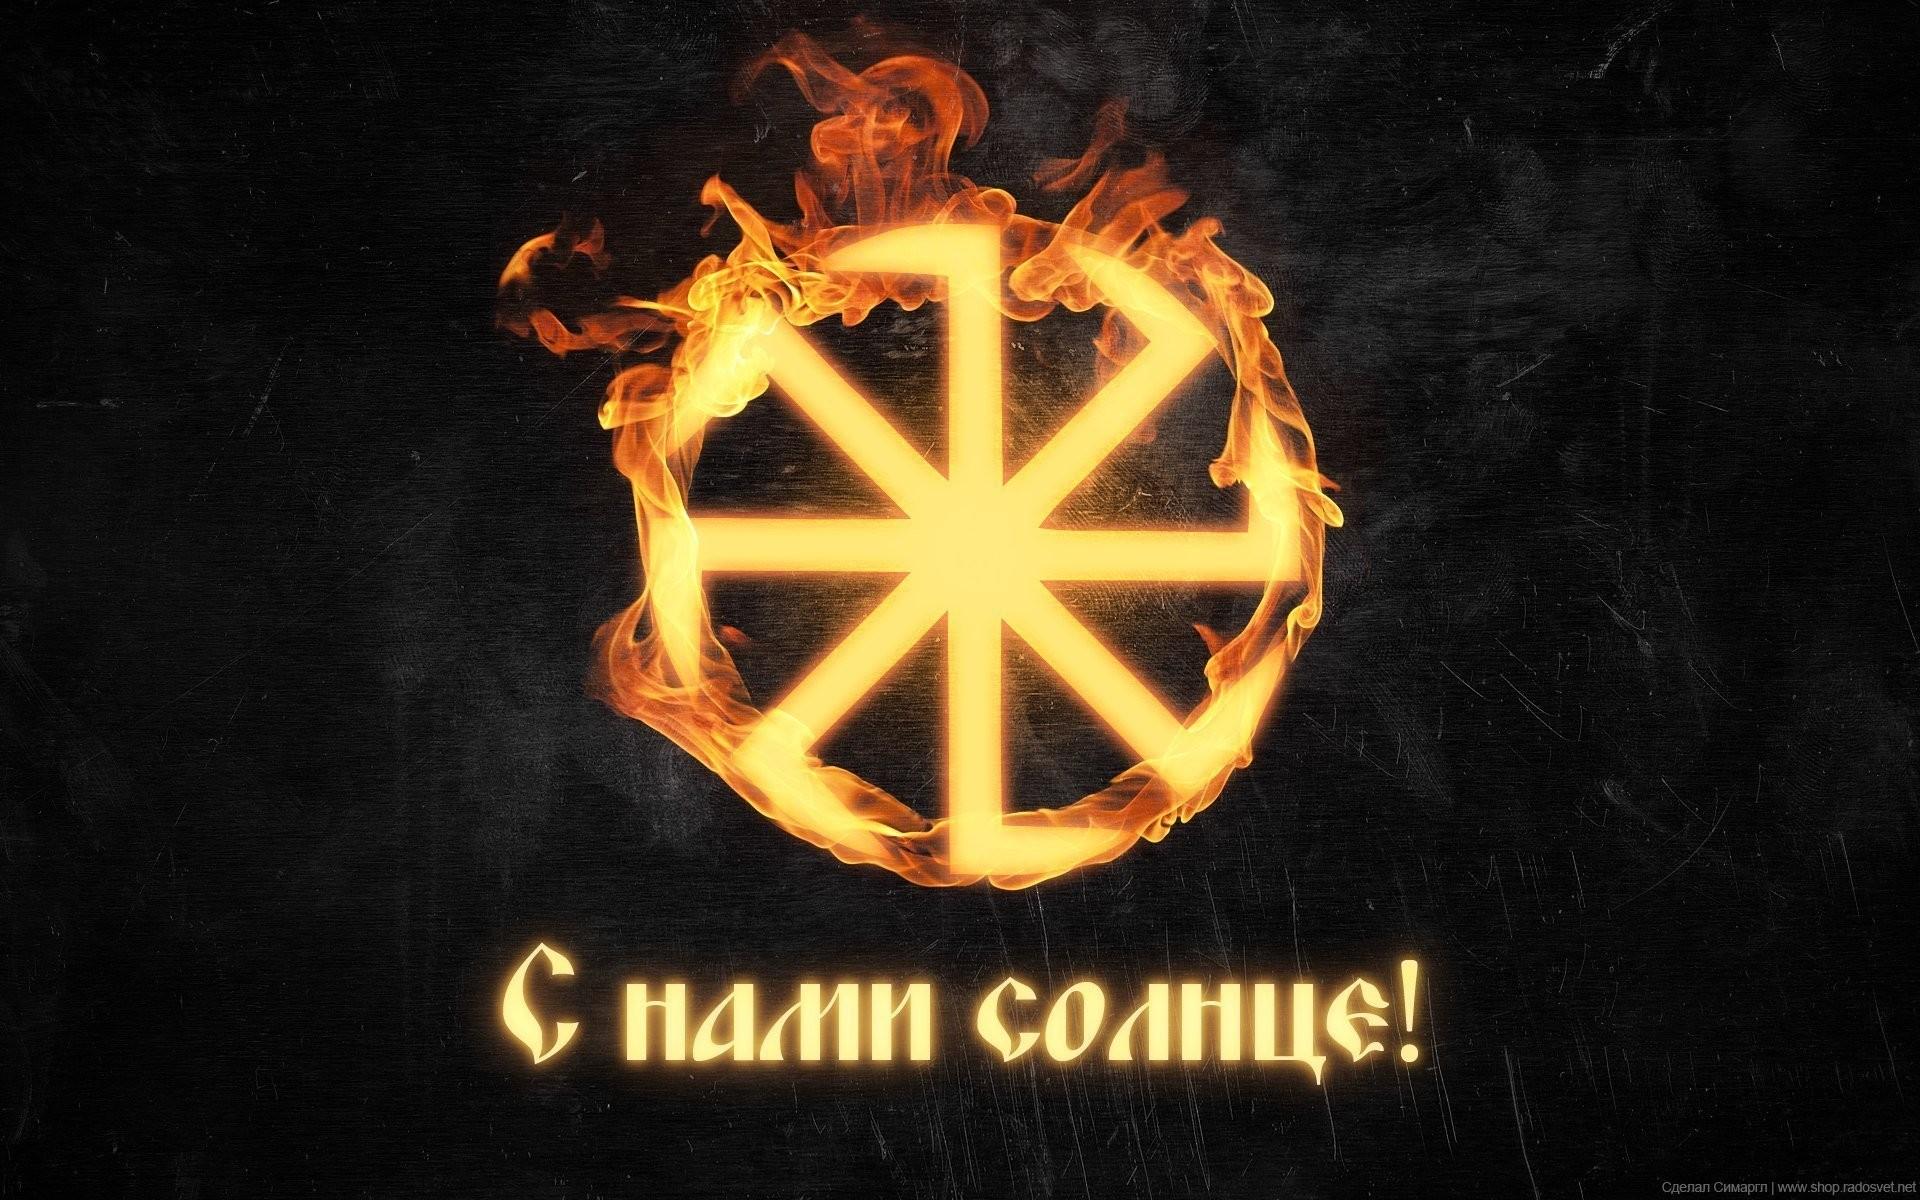 russia pagan flag russian rus rusich kolovrat brace solstice sun slavs  slavic aryan